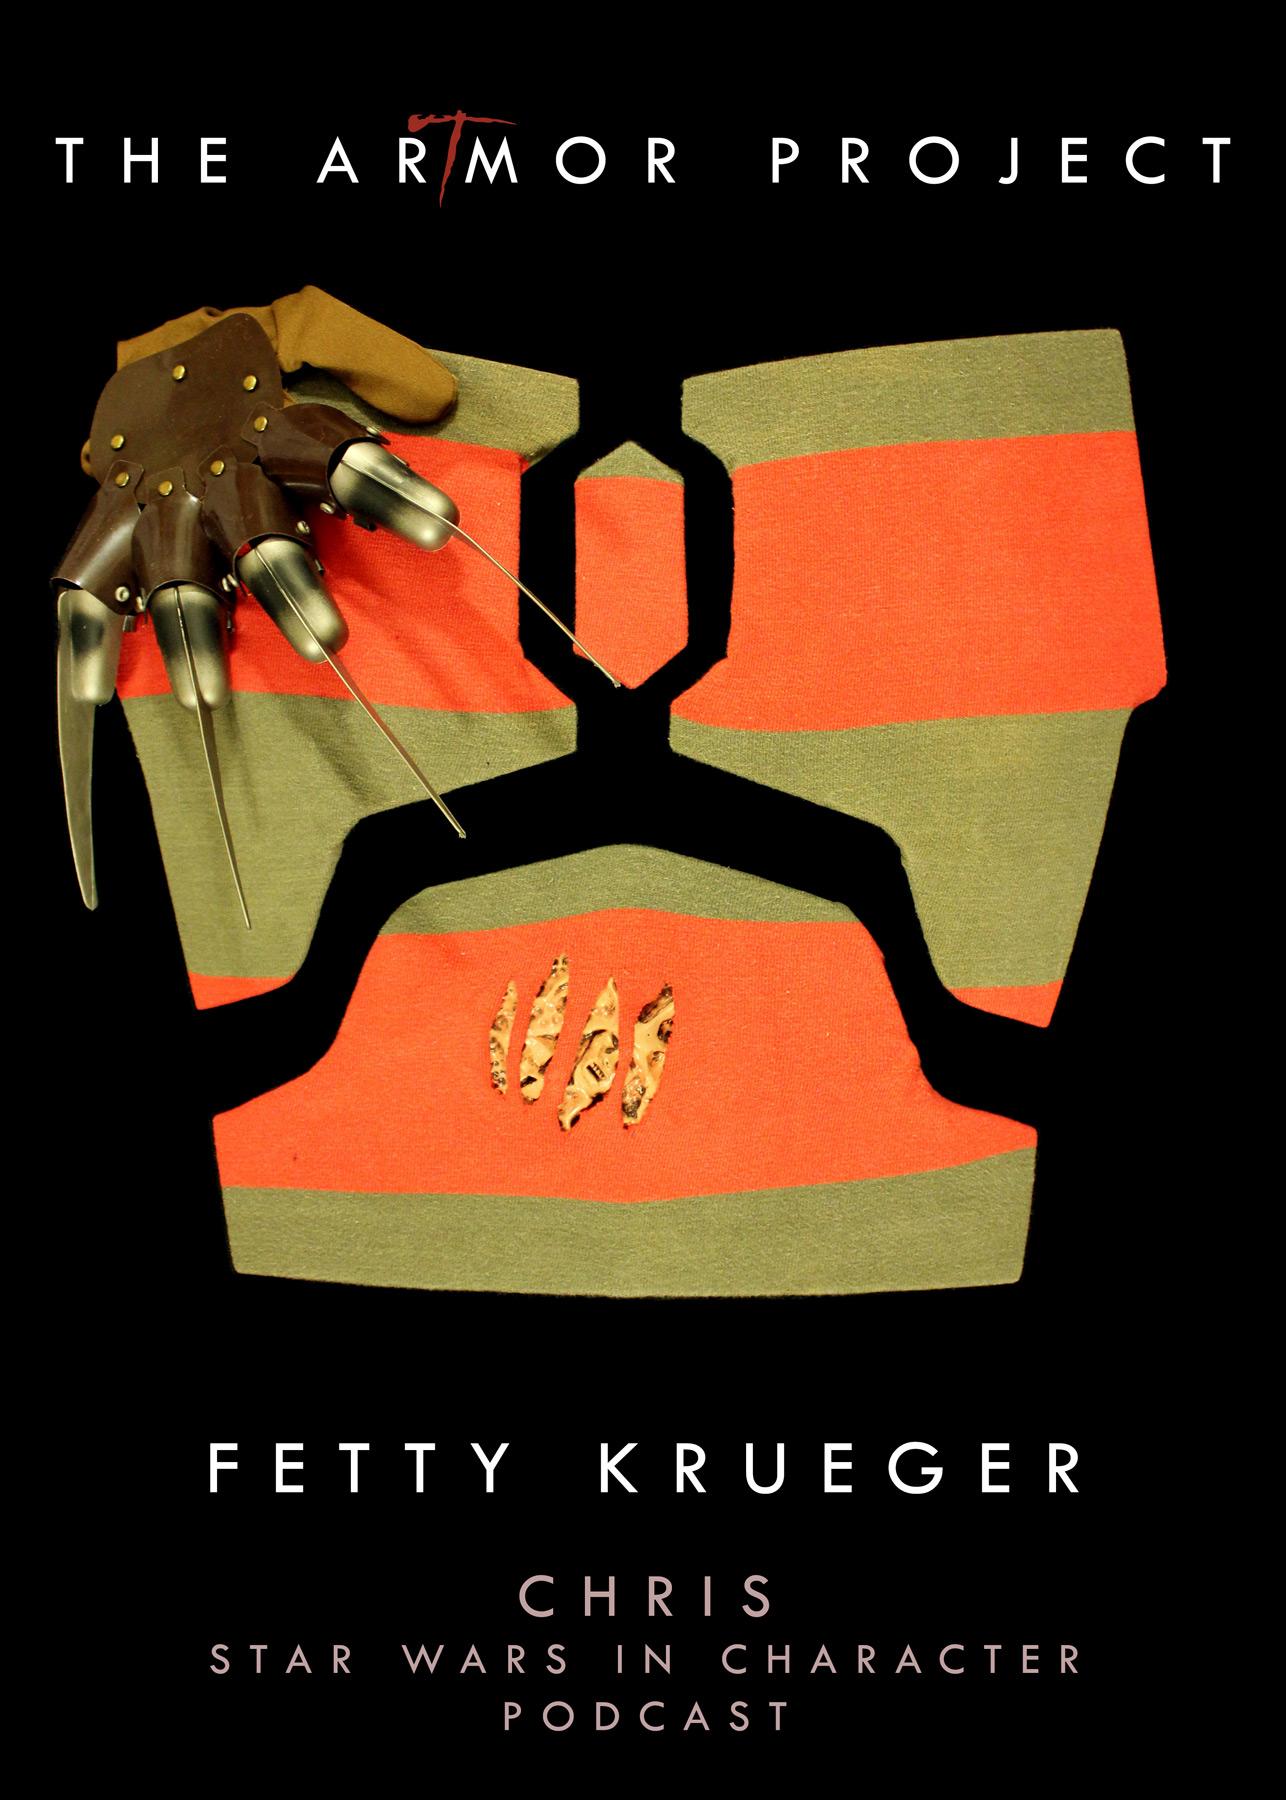 ArTmor 2014: Fetty Krueger